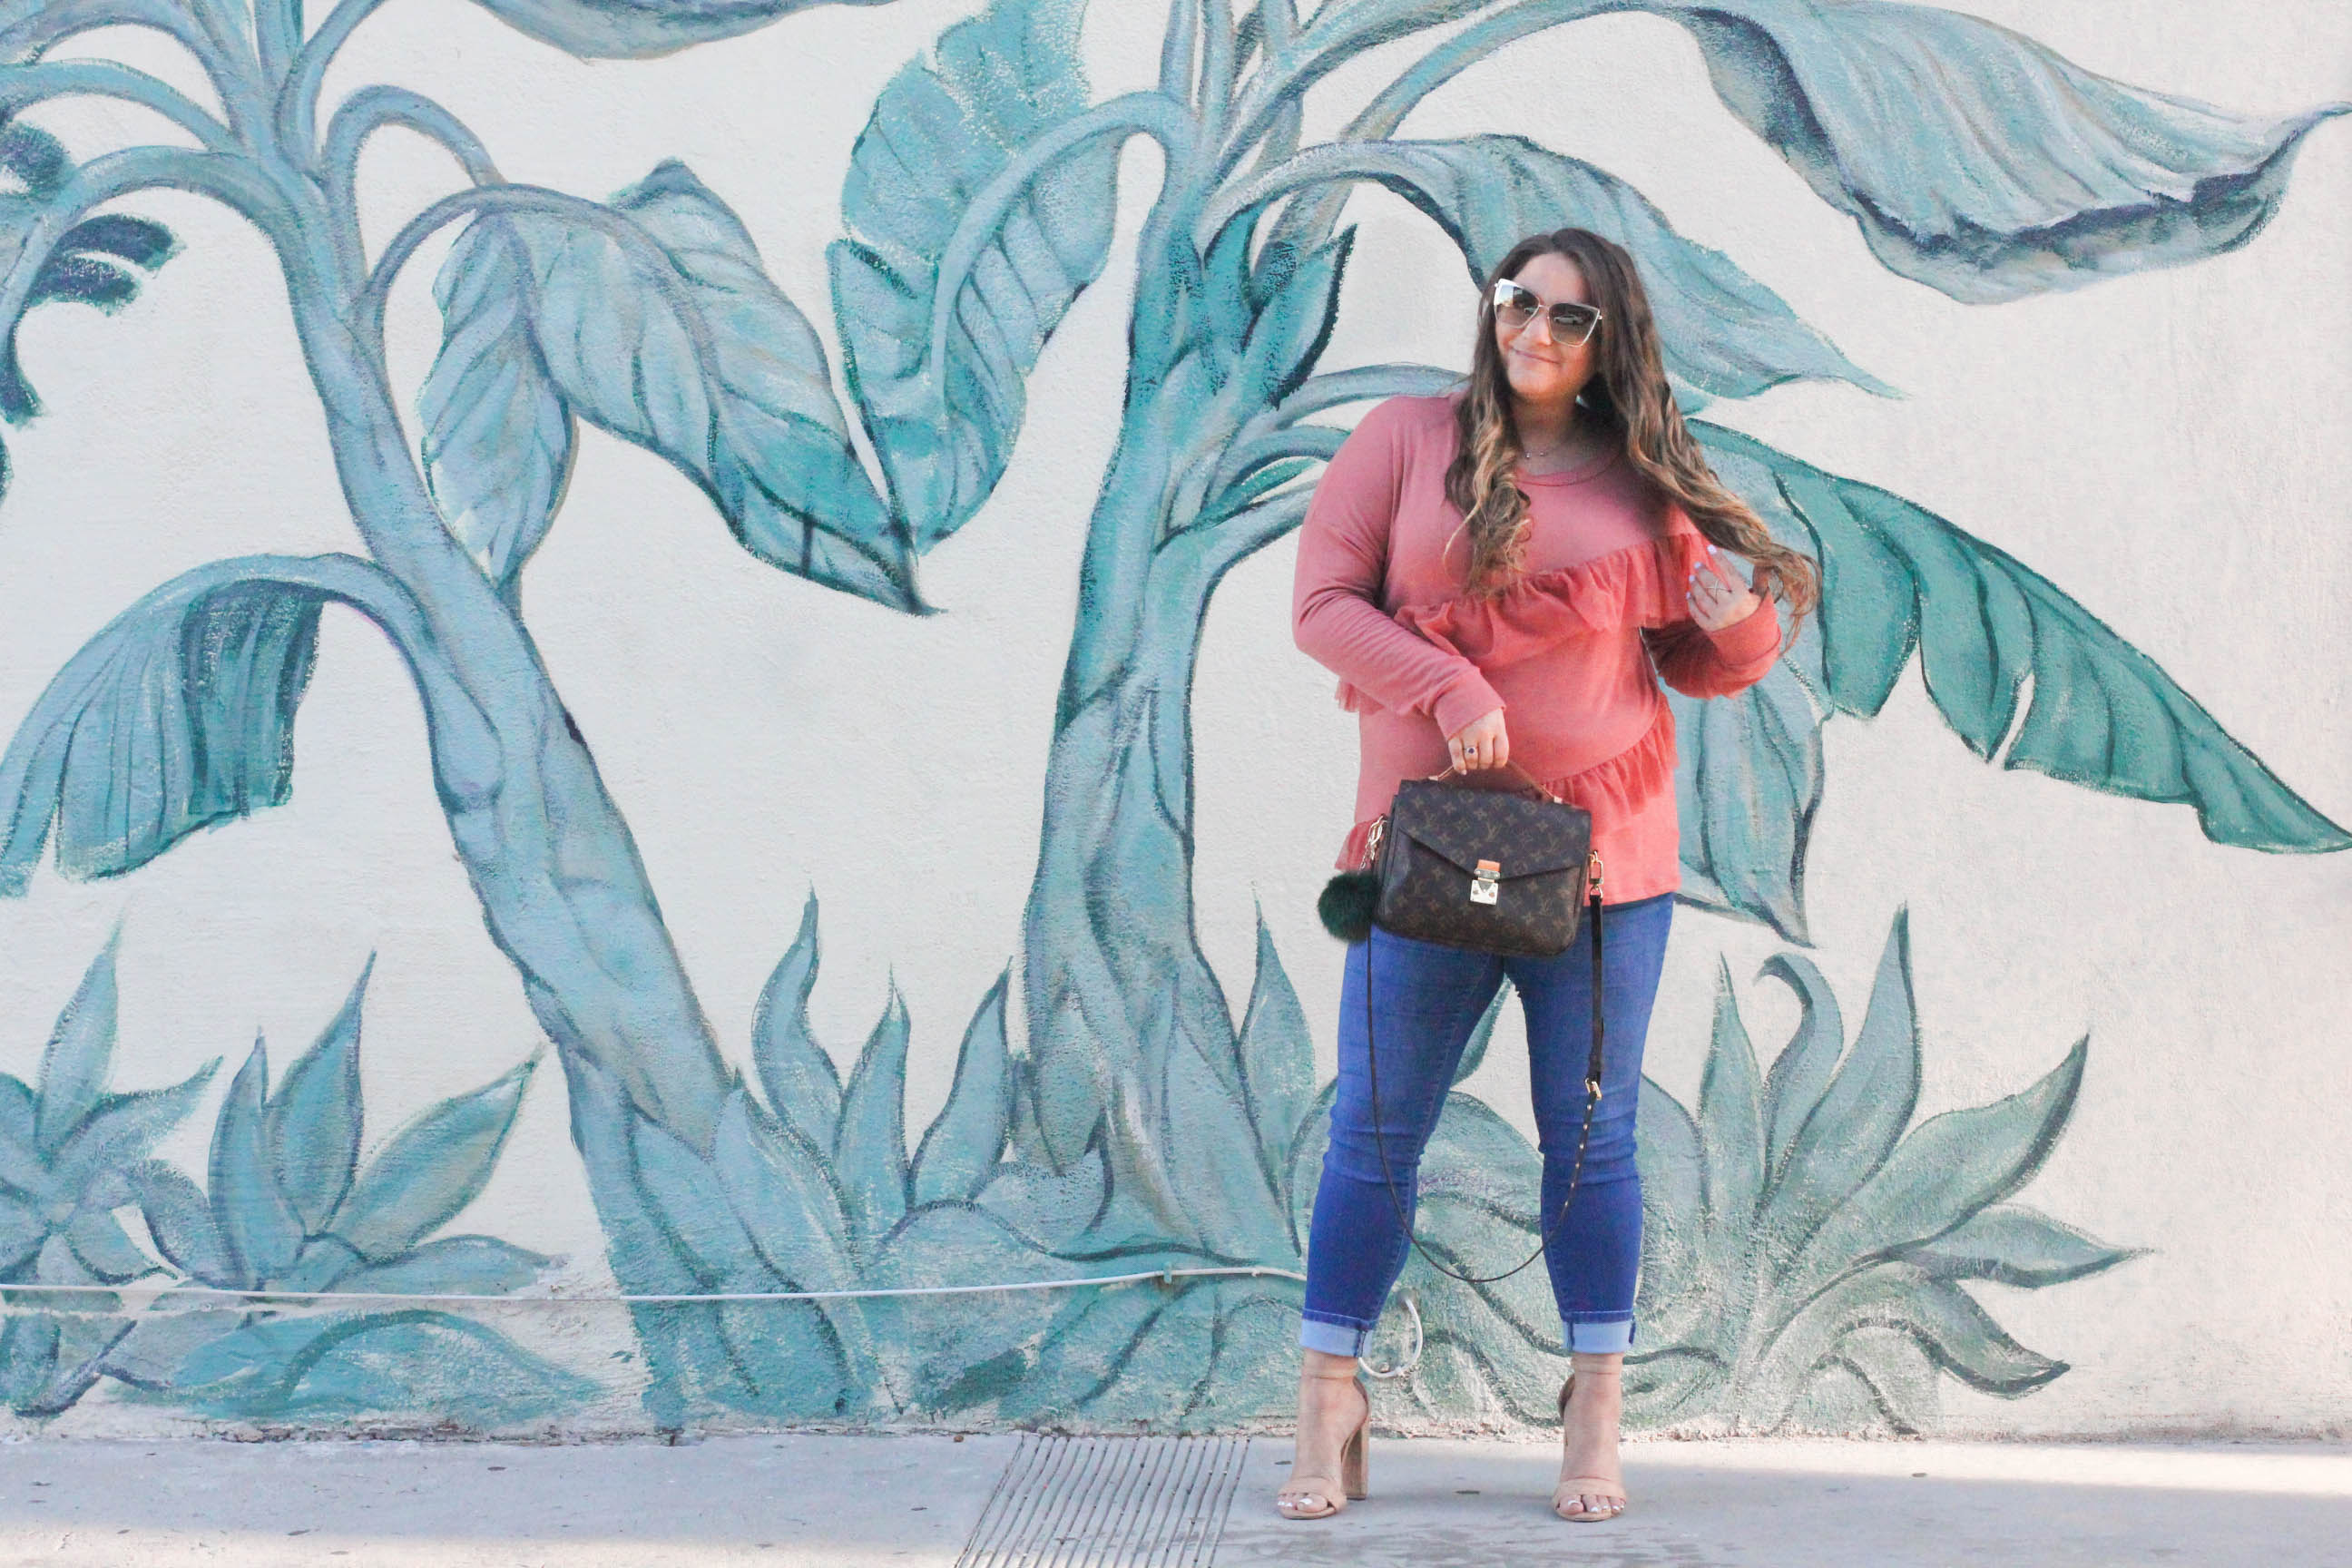 missyonmadison, missyonmadison blog, missyonmadison instagram, fashion blog, fashion blogger, style blog, style blogger, thanksgiving, what to wear to thanksgiving, thanksgiving 2017, black friday, cozy fall tops, what to wear this fall, fall style, fall 2017 style, bloglovin, nude ankle strap heels, medium wash jeans, skinny jeans, faux fur vest, diff eyewear, diff eyewear sunglasses, orange top, orange sweater, palm print wall, palm print mural, la wall crawl,